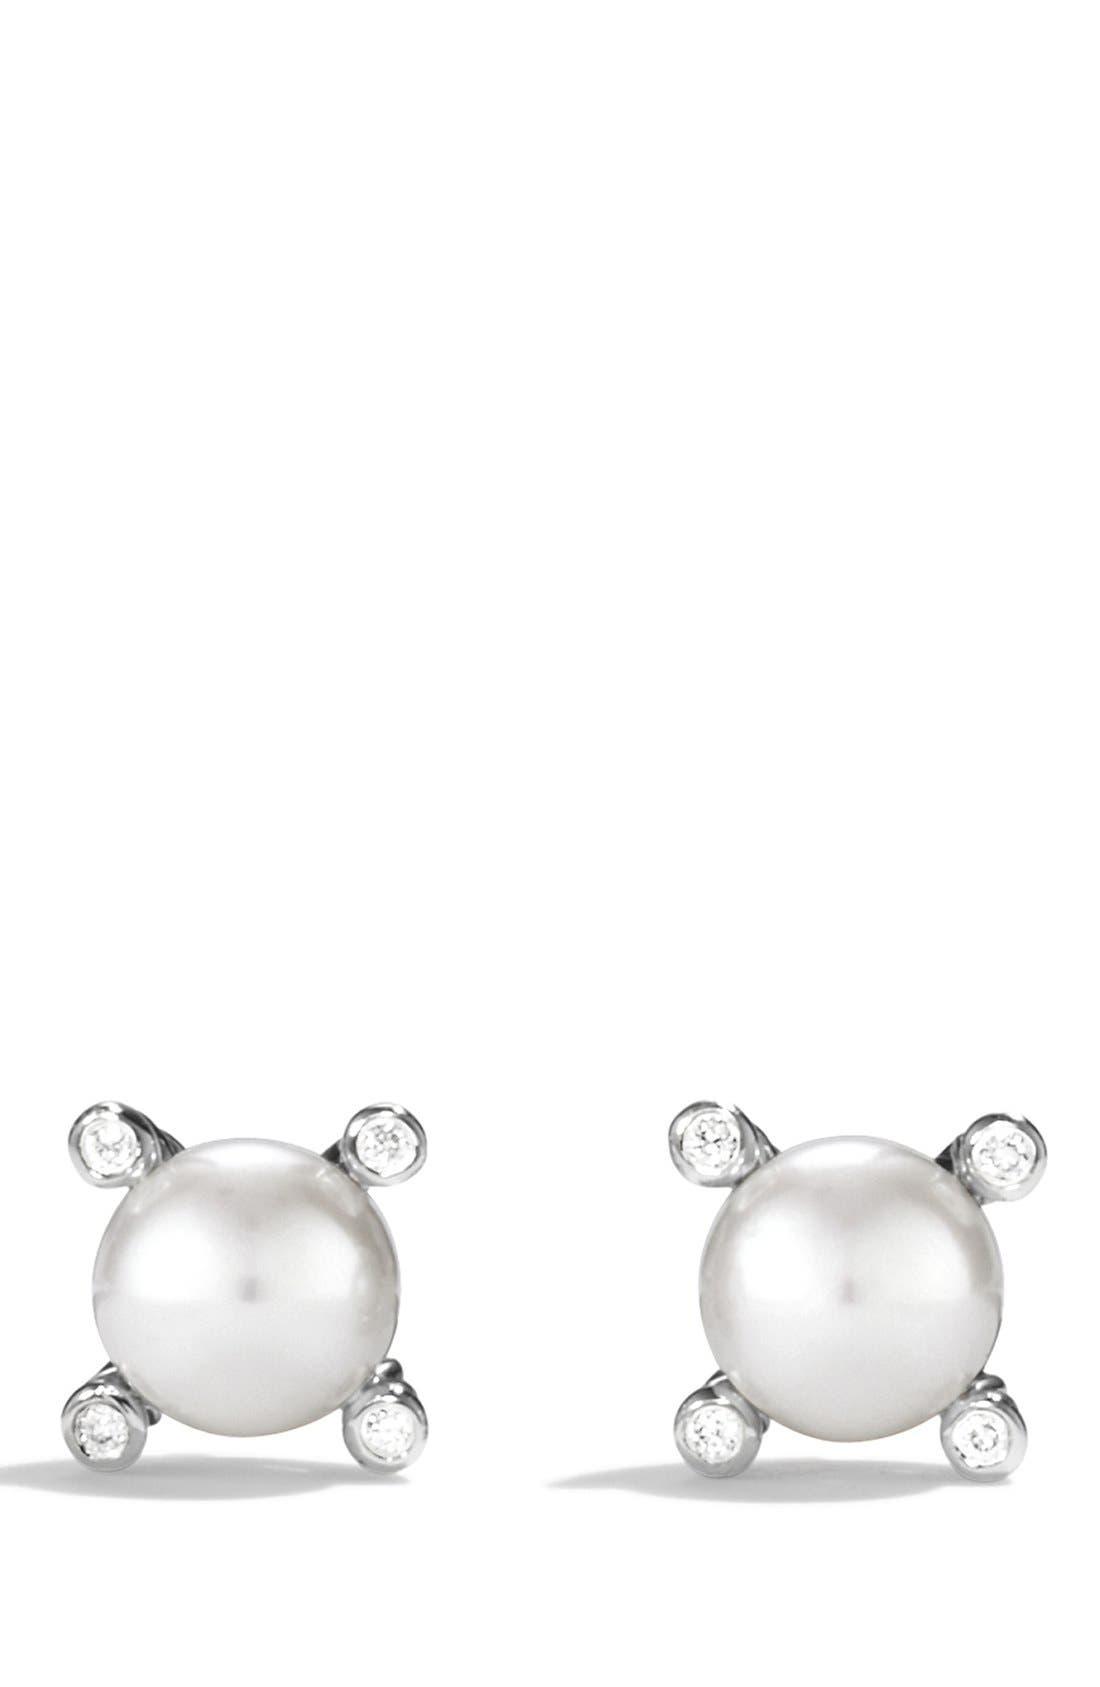 Alternate Image 1 Selected - David Yurman Small Pearl Earrings with Diamonds